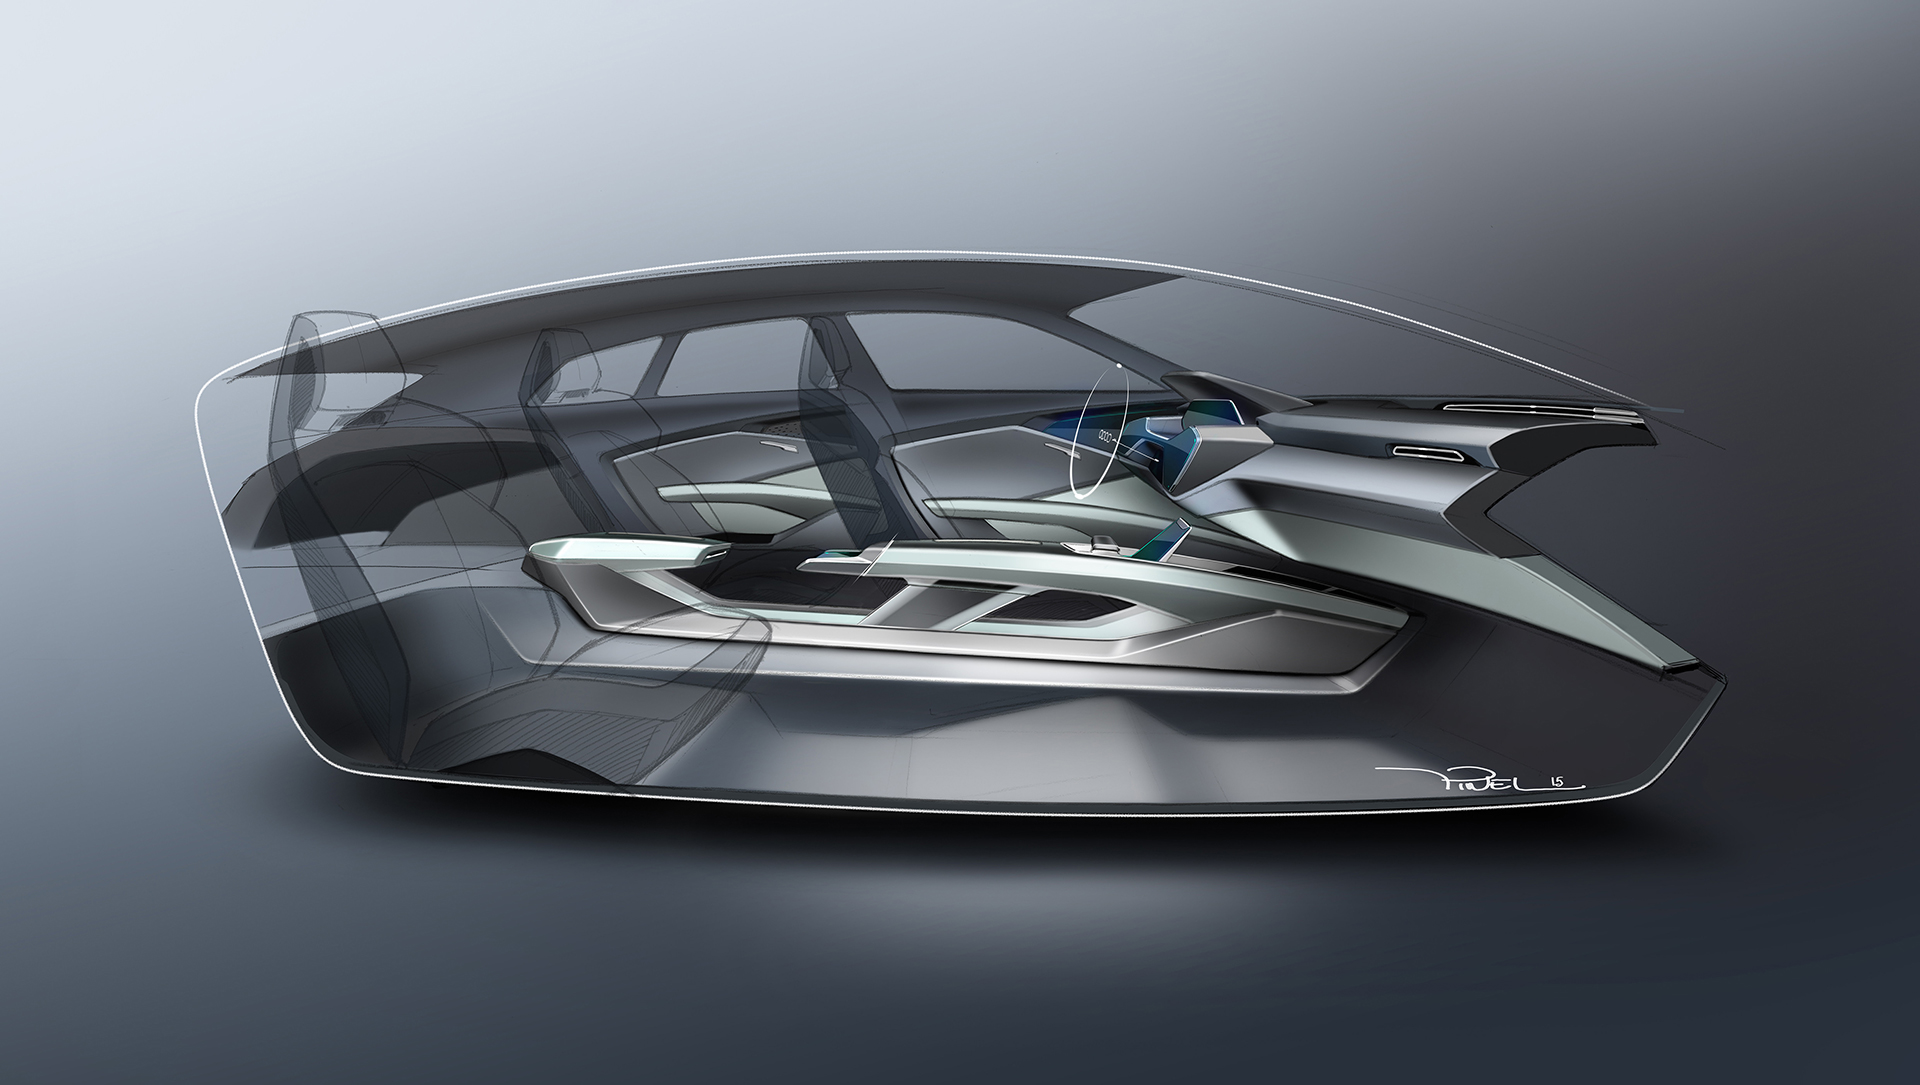 Audi e-tron quattro concept - 2016 - sketch design - interior / intérieur